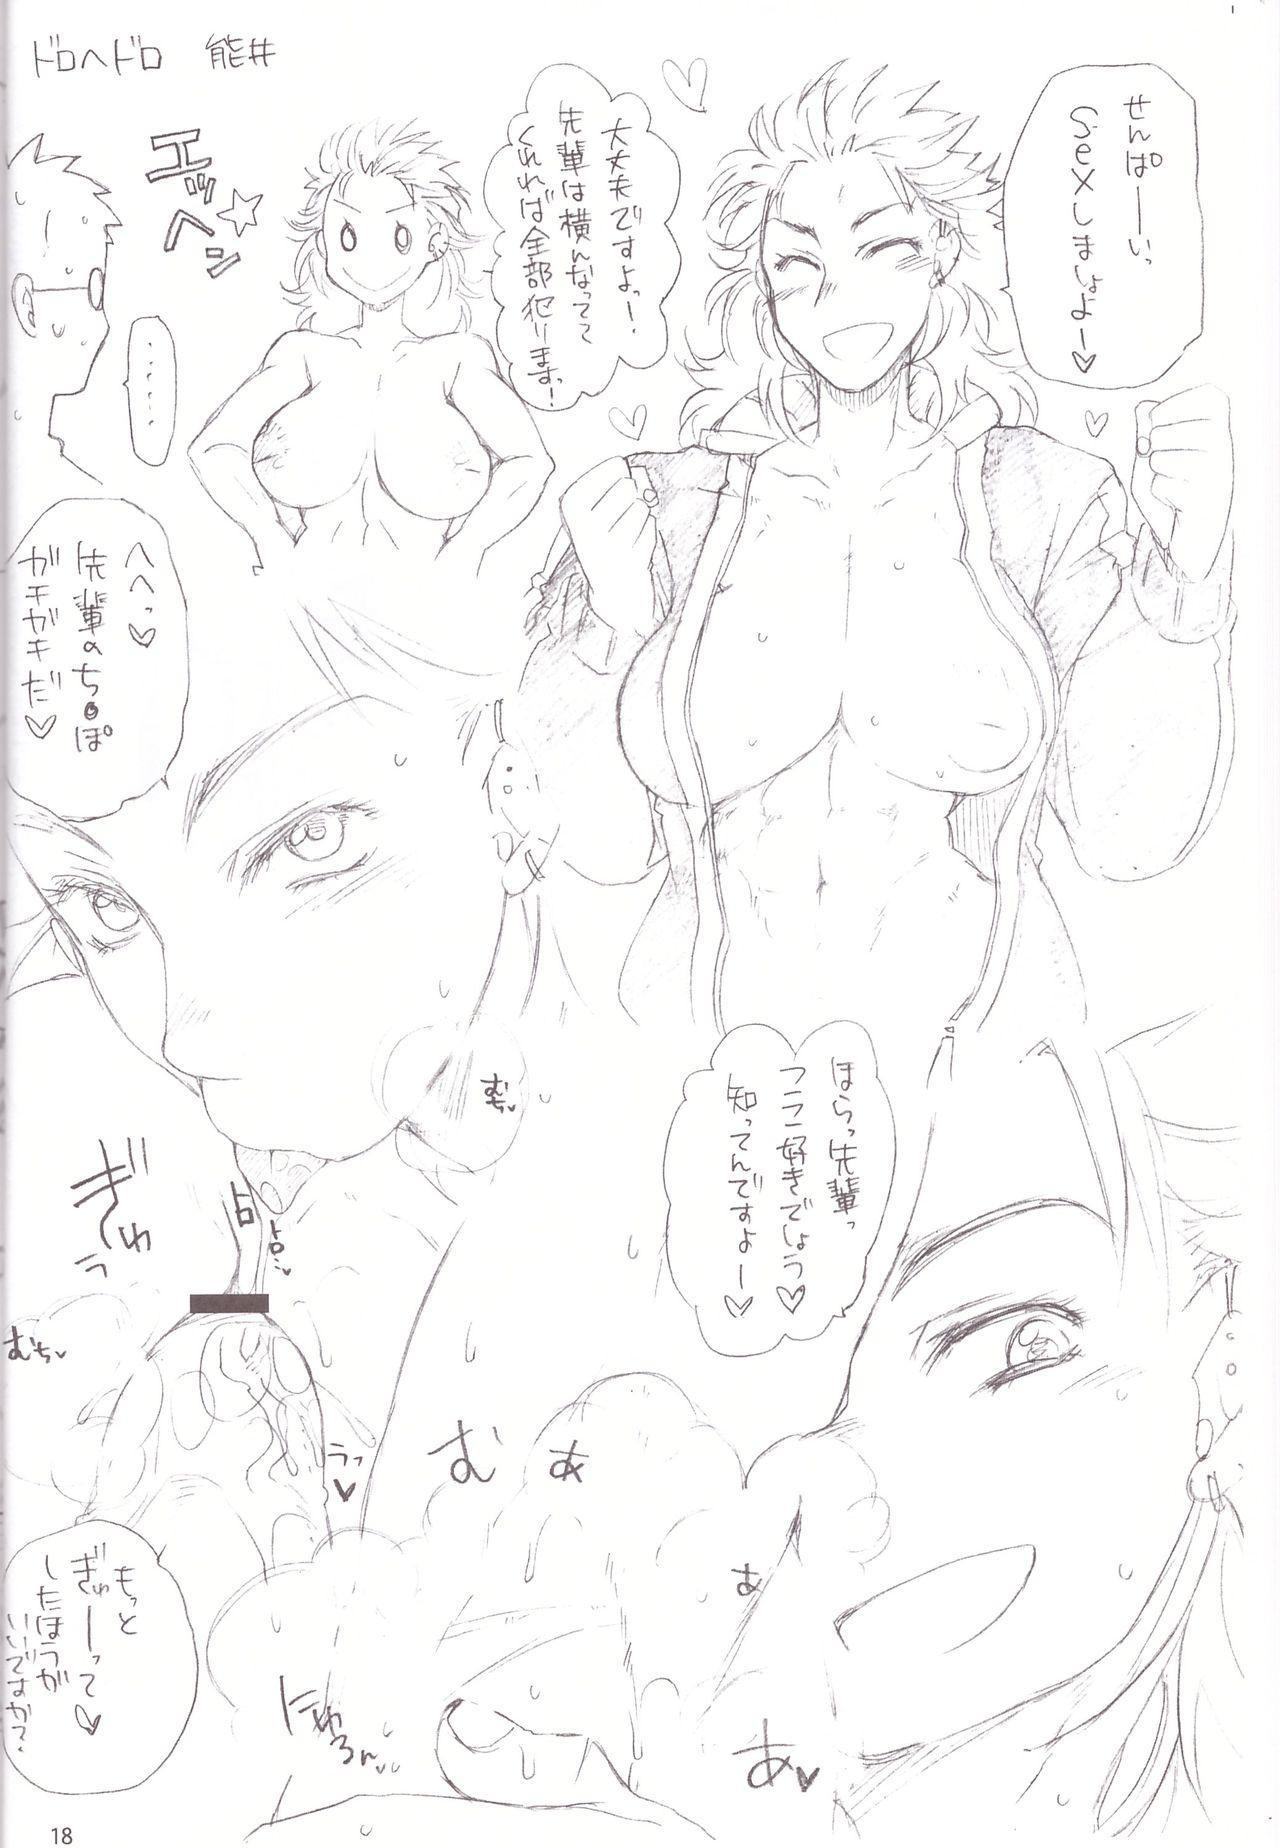 Hentai Fetish's 2 17